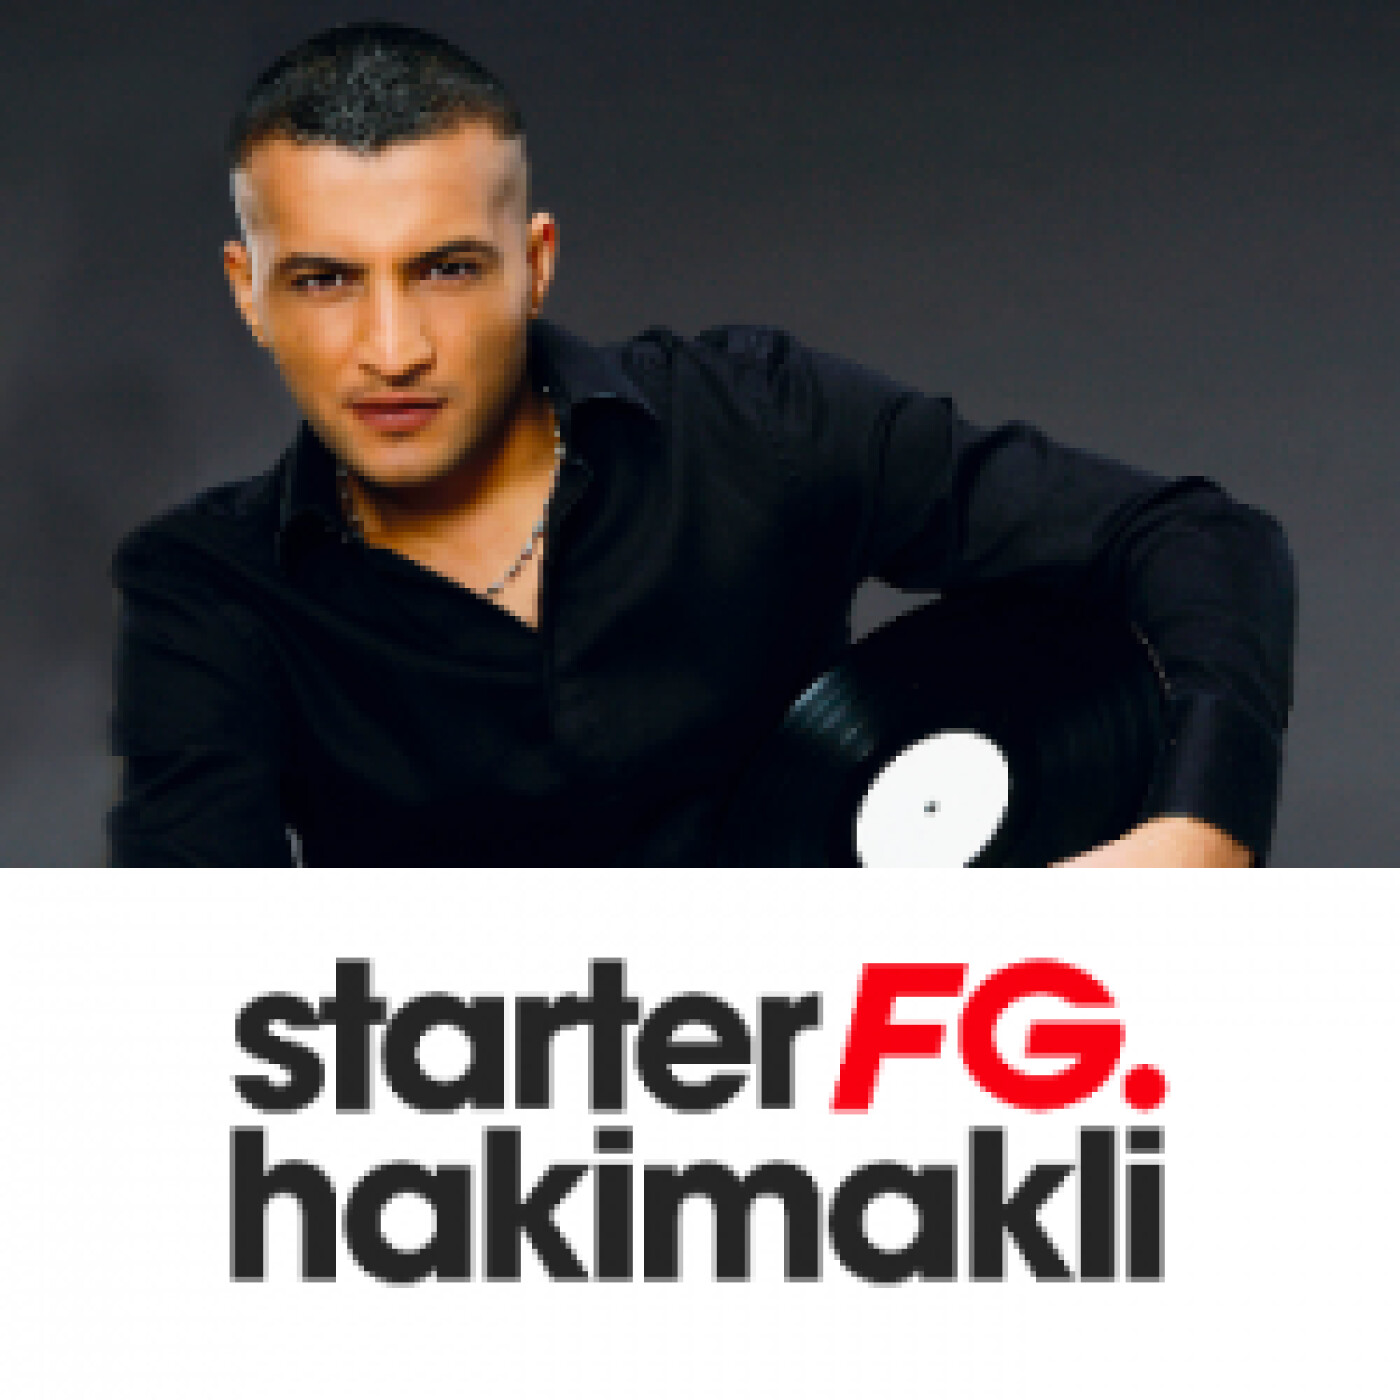 STARTER FG BY HAKIMAKLI MERCREDI 20 JANVIER 2021